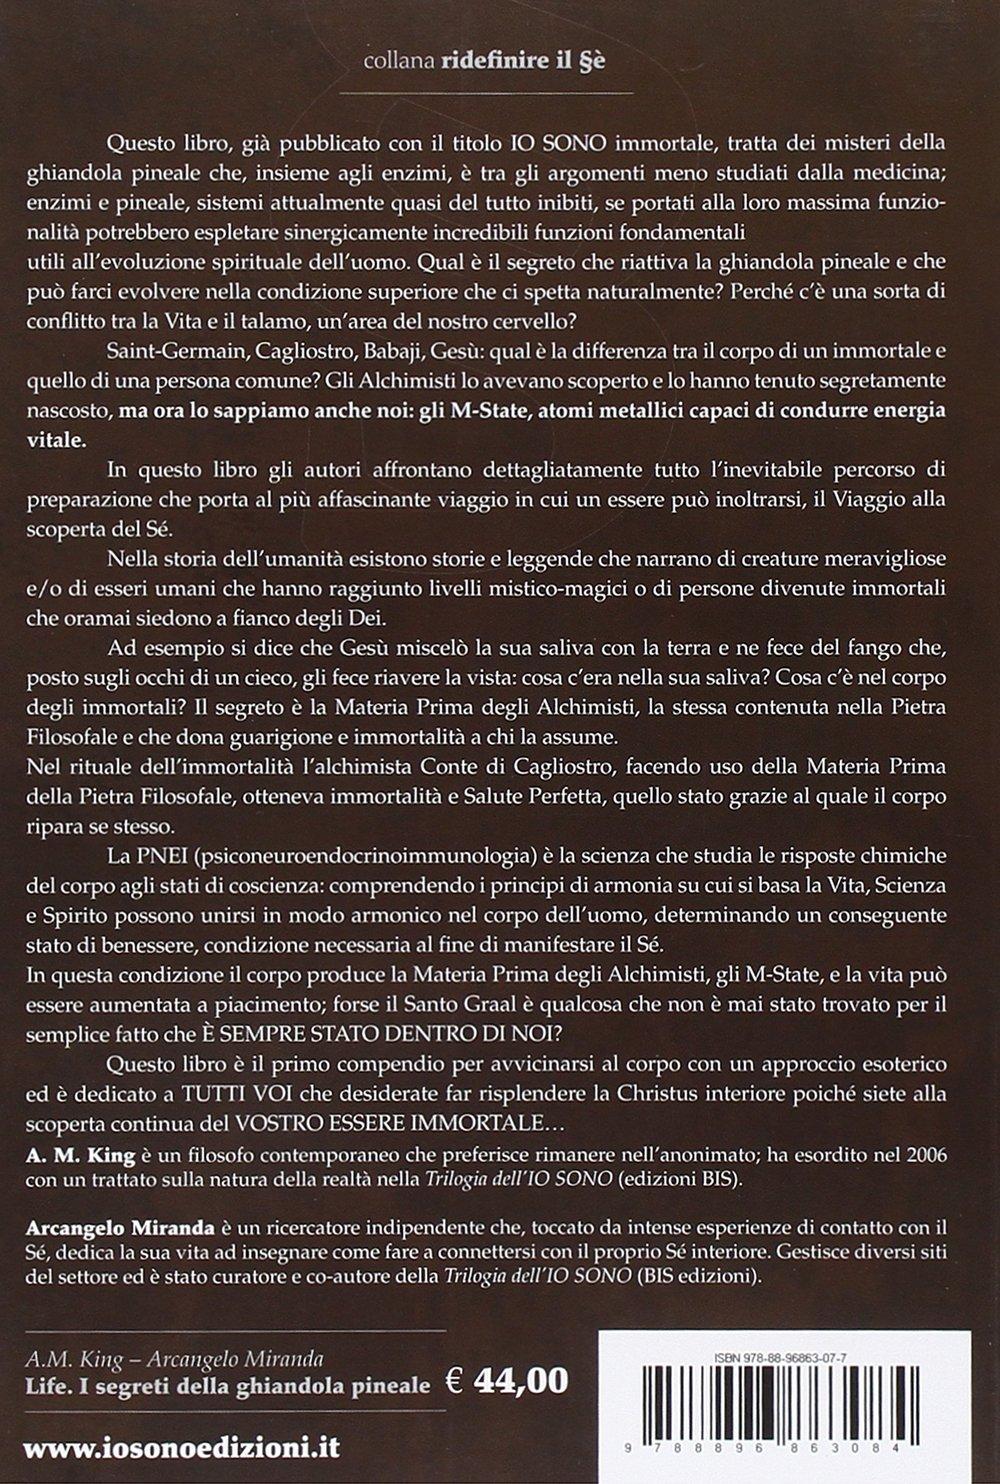 I segreti della ghiandola pineale: Amazon.es: Arcangelo Miranda, A. M. King: Libros en idiomas extranjeros